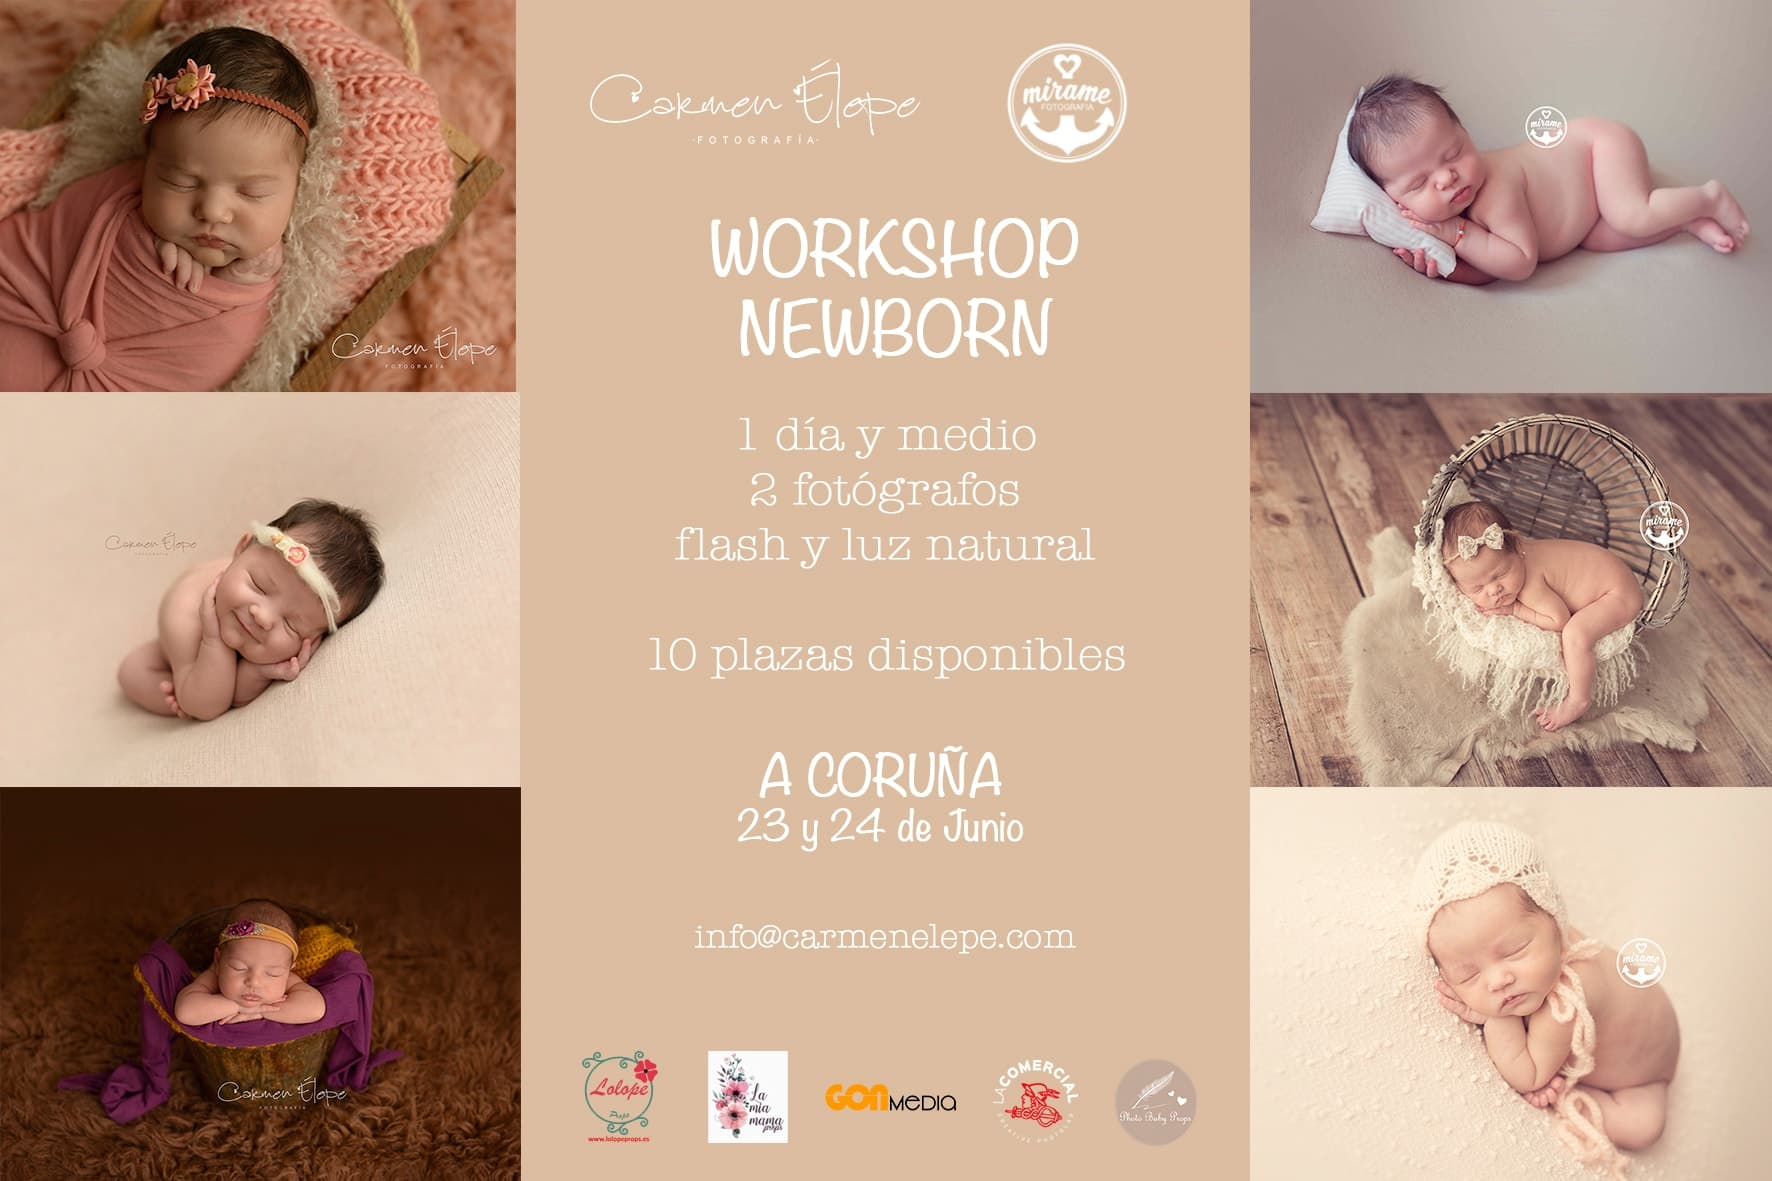 workshop fotografia newborn espana galicia a coruna carmen elepe mirame fotografia